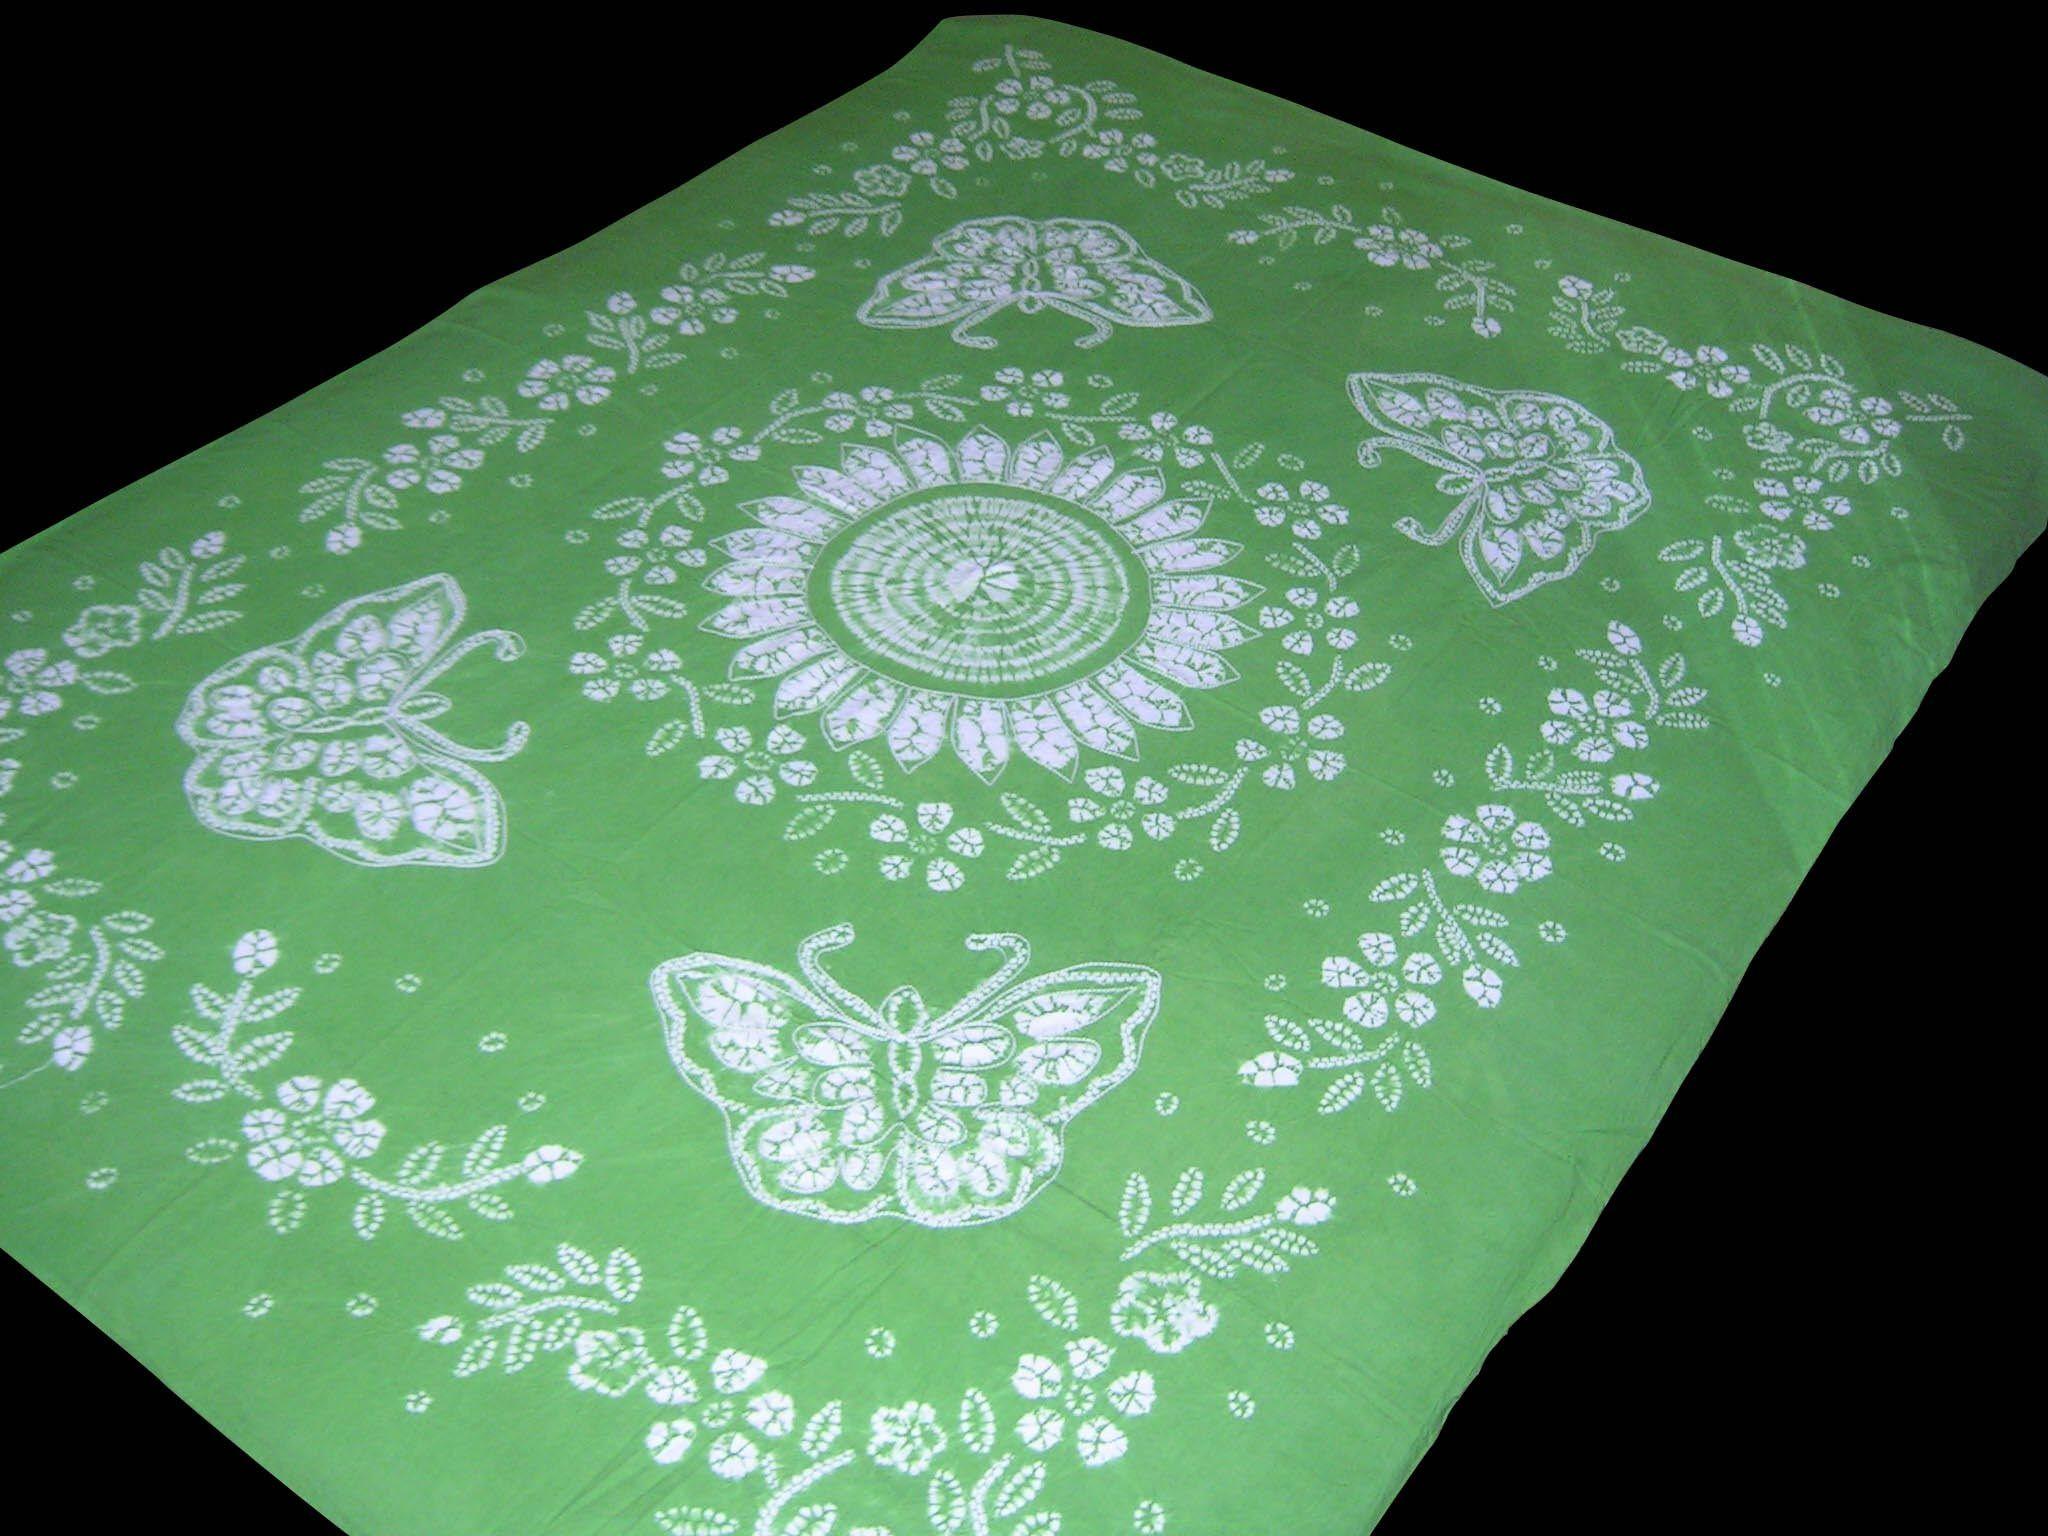 2018 100% Handmade Batik Art Pure Cotton Bed Sheet Spread Linen Bedding  Queen #237 From Orientalhome, $62.54 | Dhgate.Com